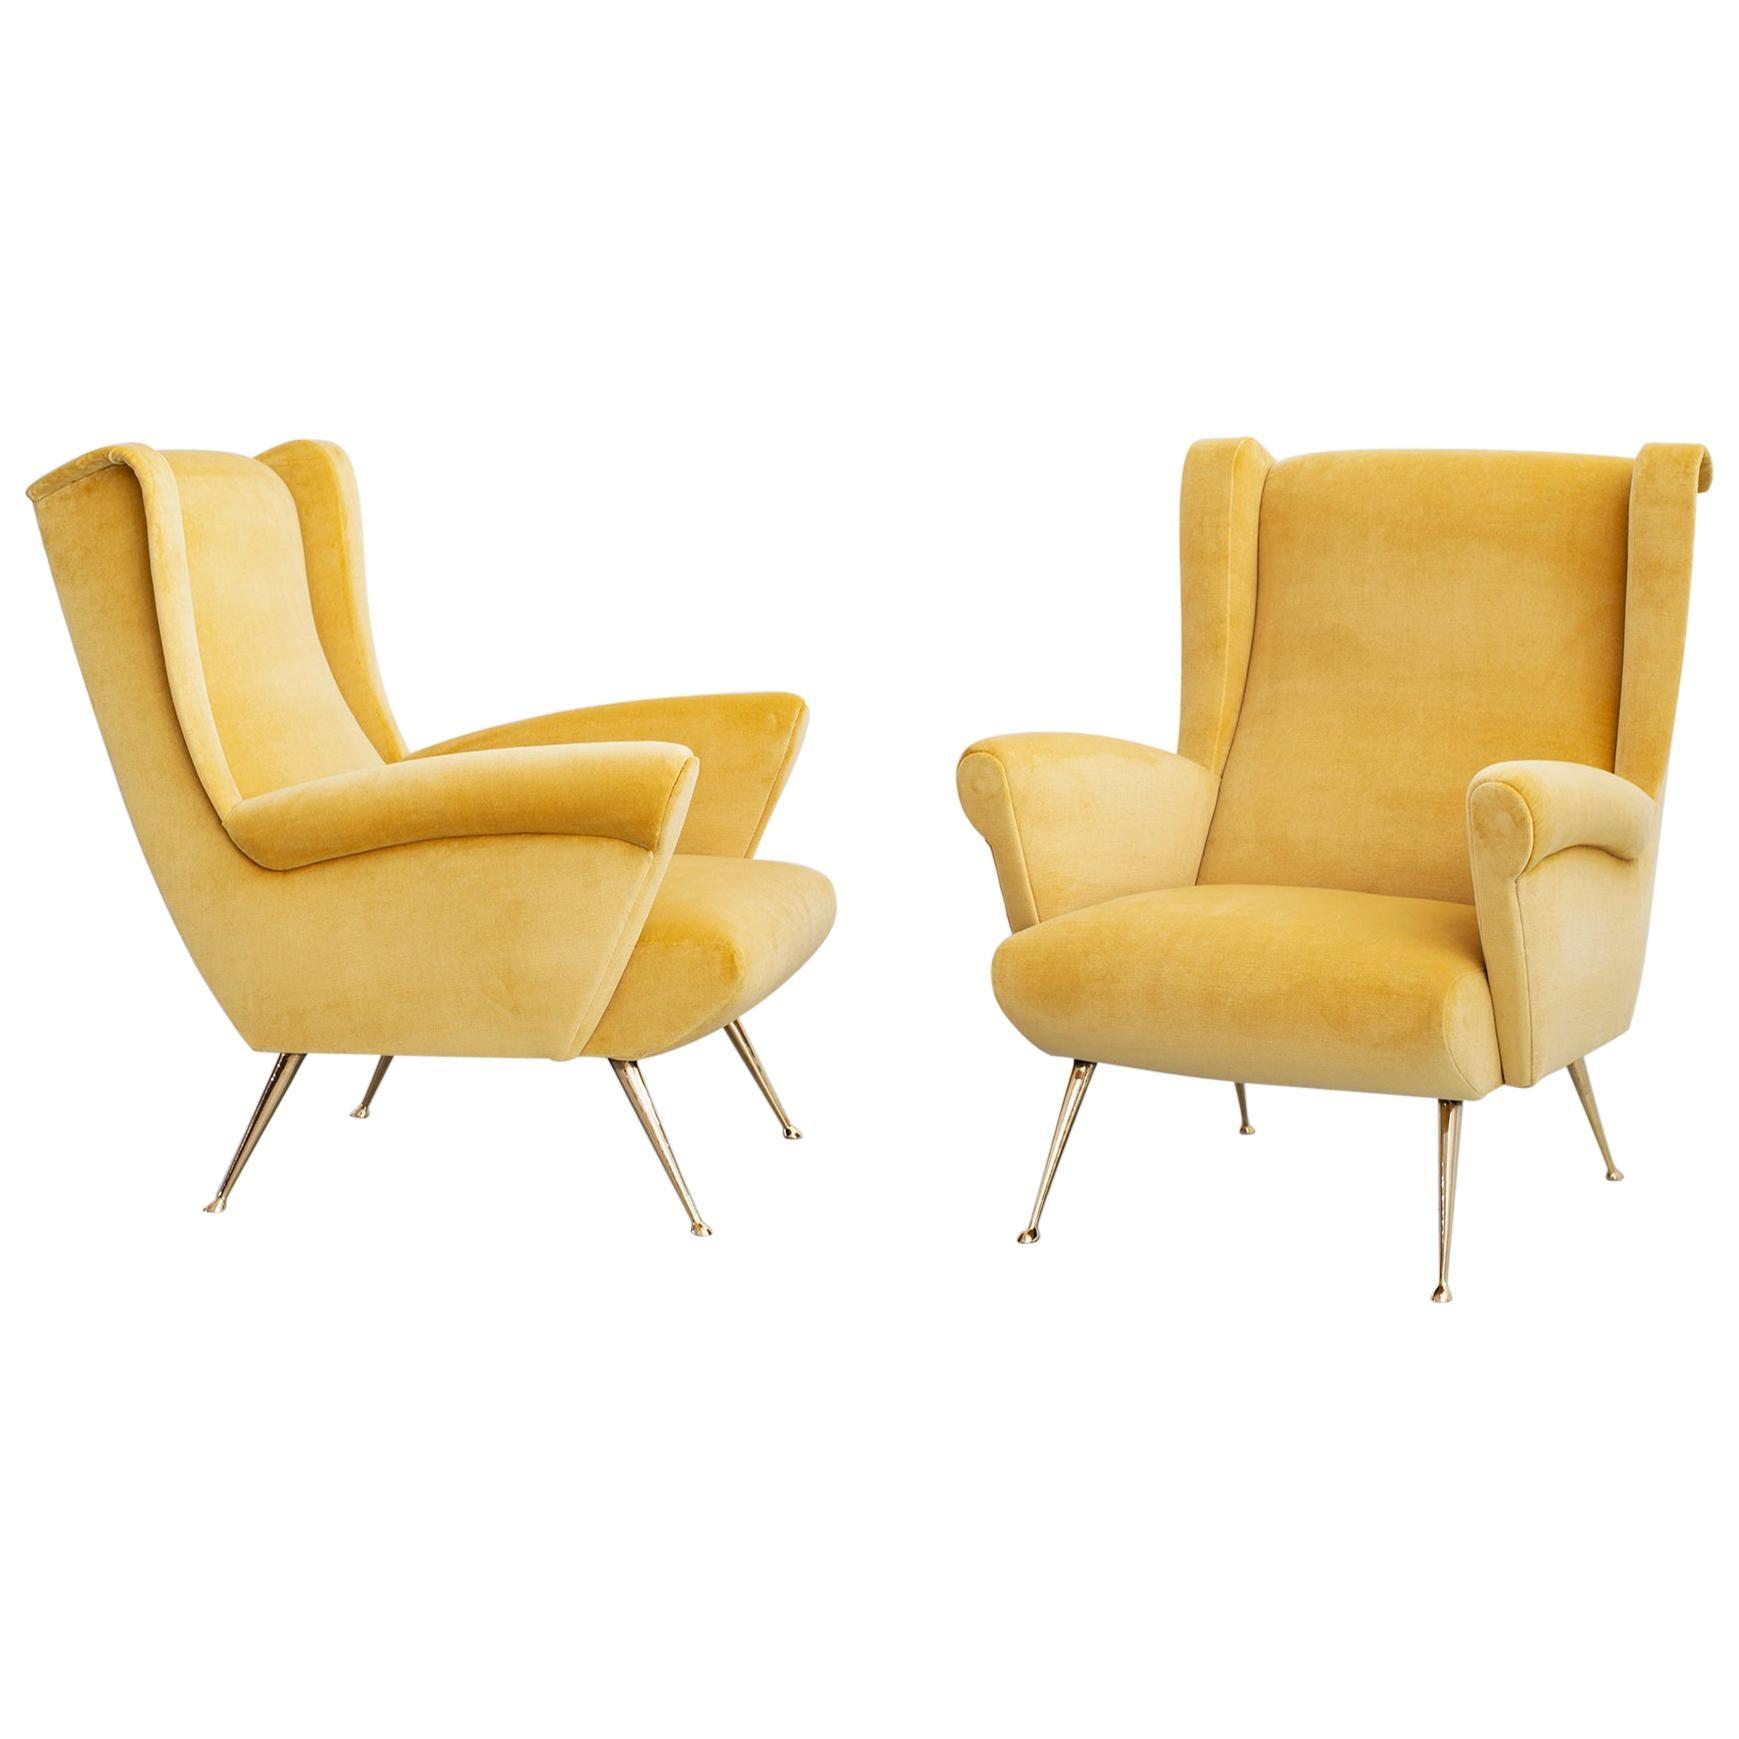 Gio Ponti Style Club Chairs